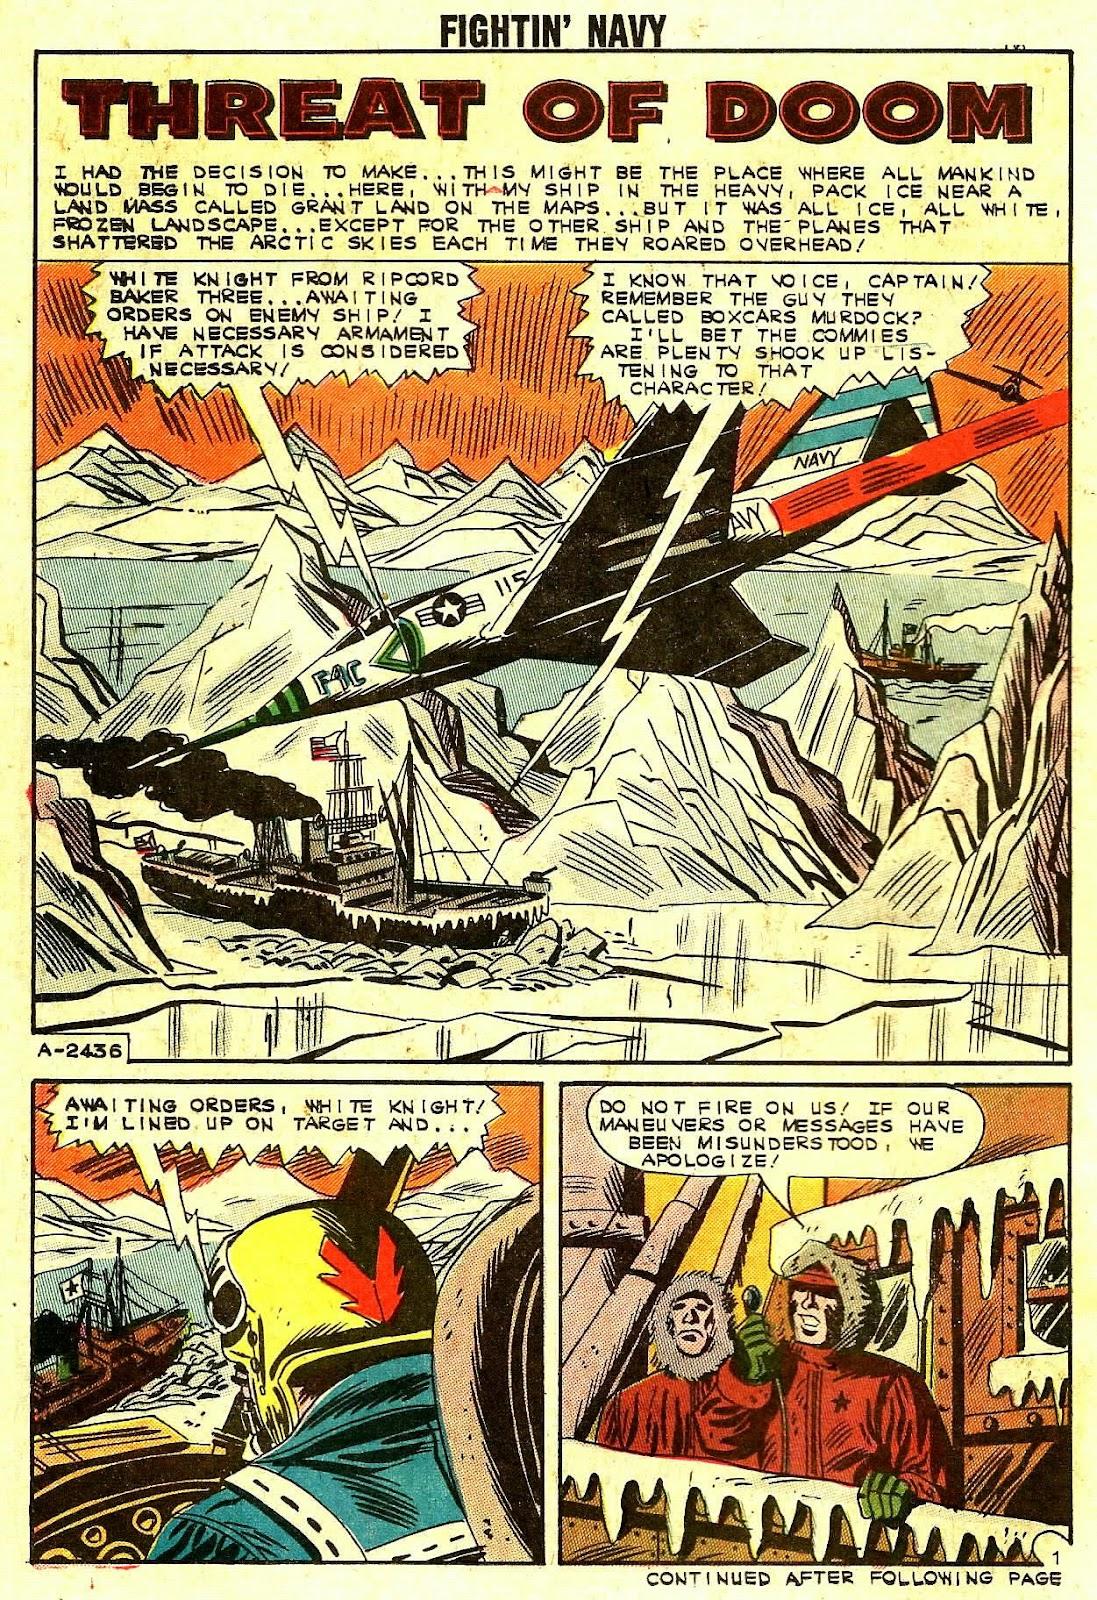 Read online Fightin' Navy comic -  Issue #109 - 14